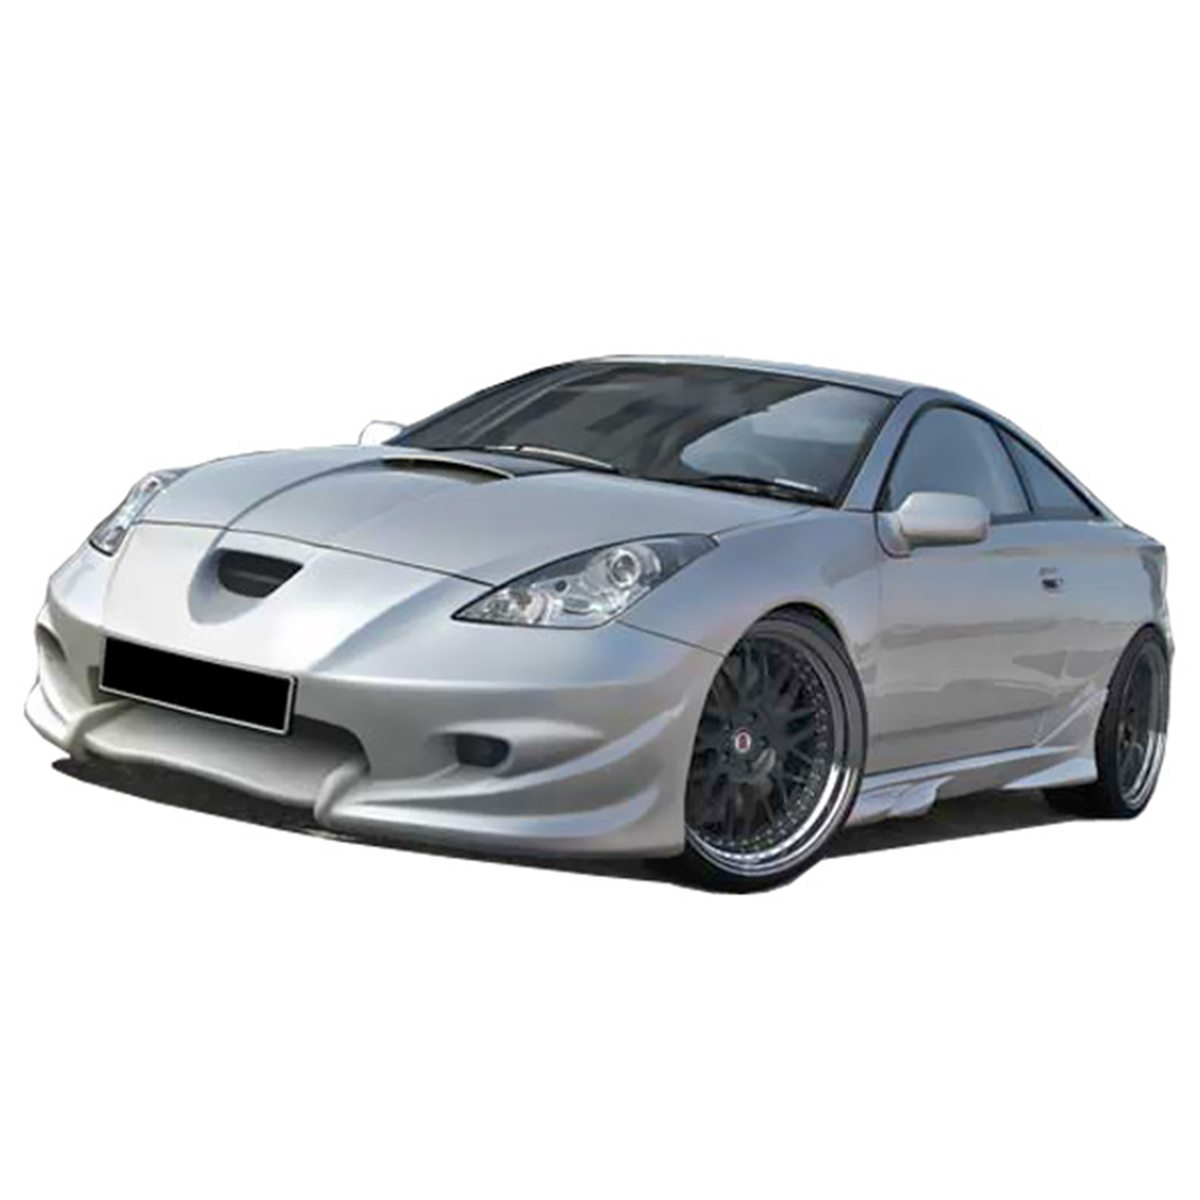 Toyota-Celica-00-Flash-Frt-PCU0360.1